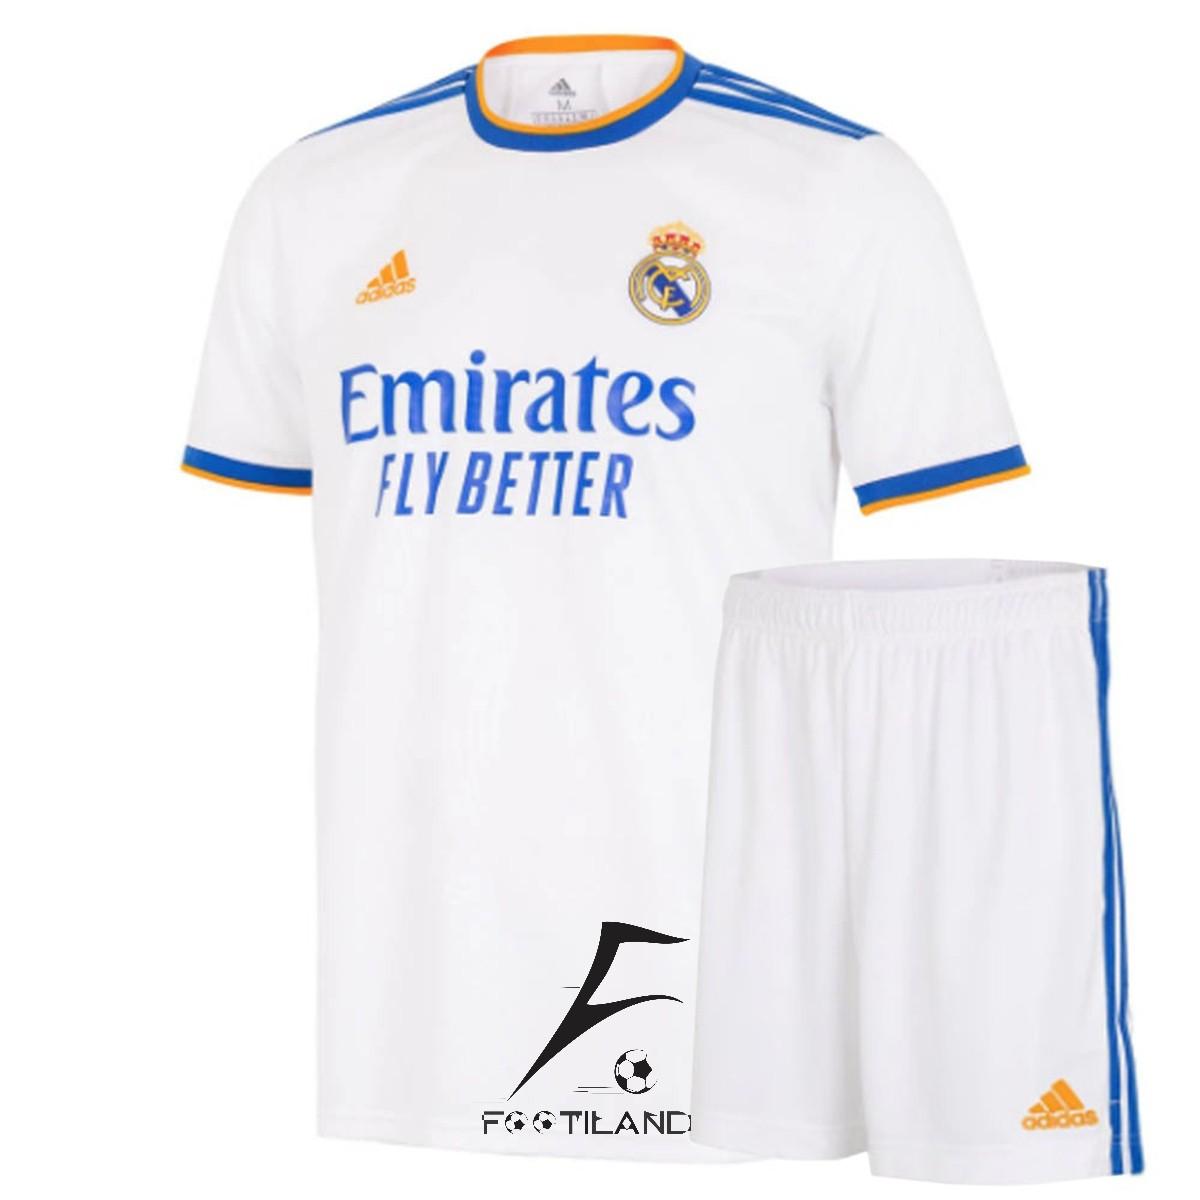 پیراهن شورت رئال مادرید 2022 اول